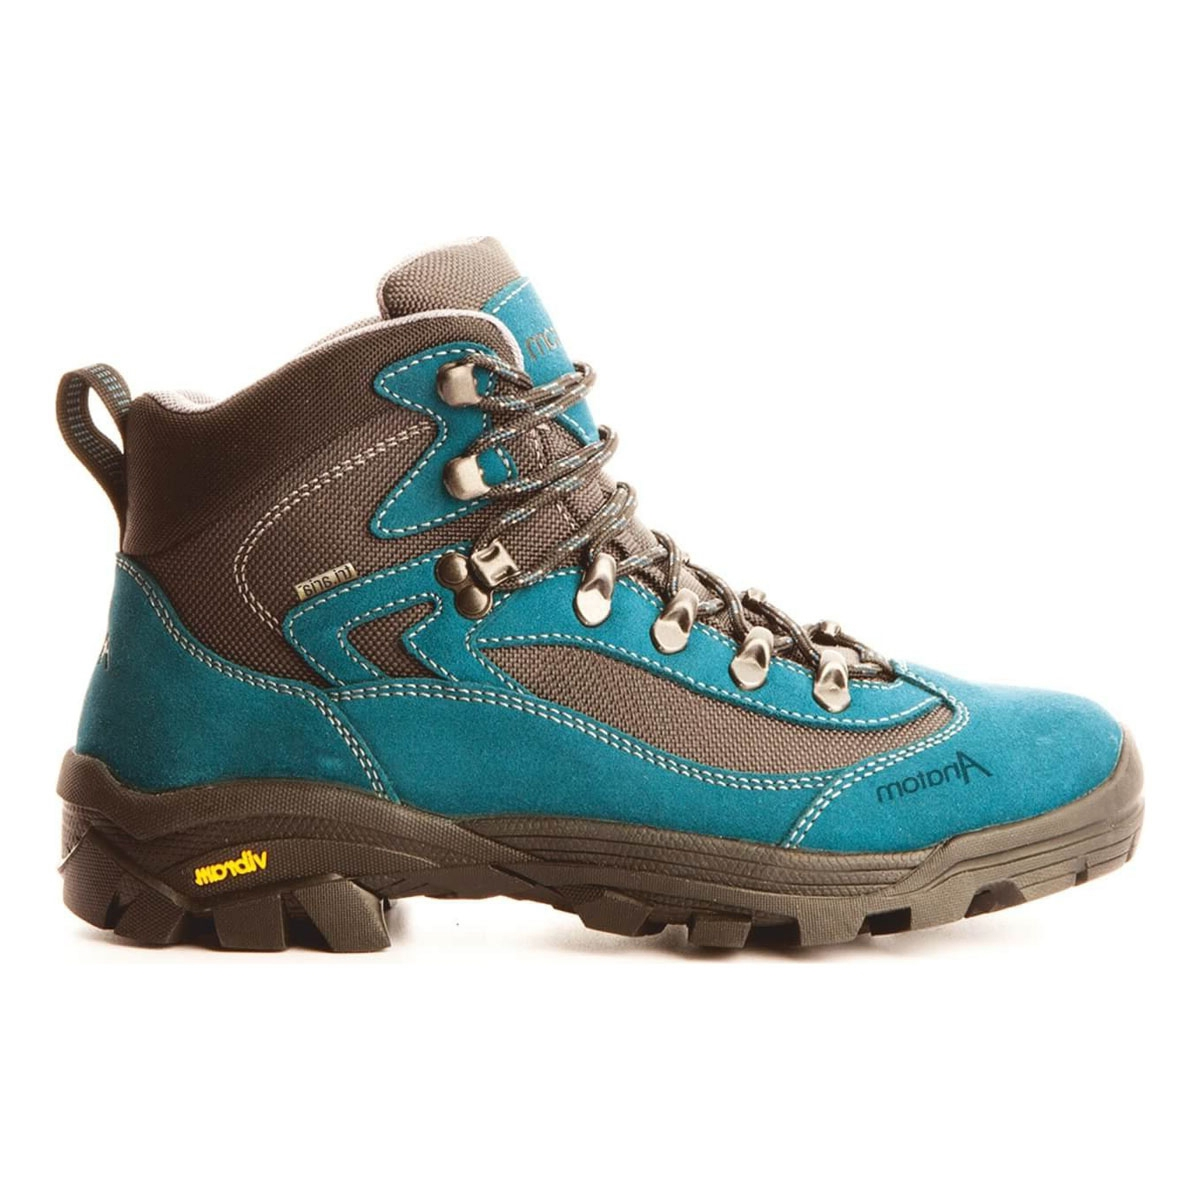 Anatom V2 Lomond Walking Boots (Women's